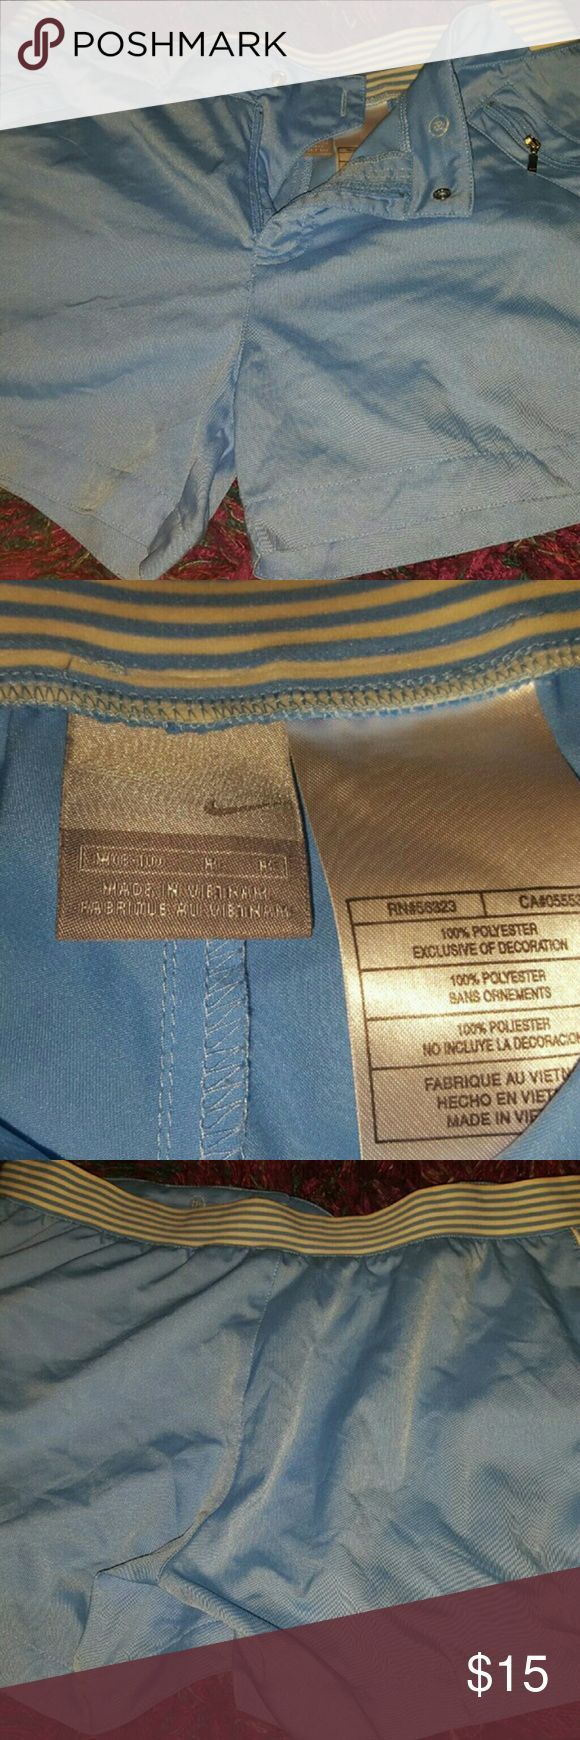 Damen, Nike, Shorts, Größe M ** Akzeptiert angemessene Angebote ** Damen, Nike, …   – Shorts Outfit